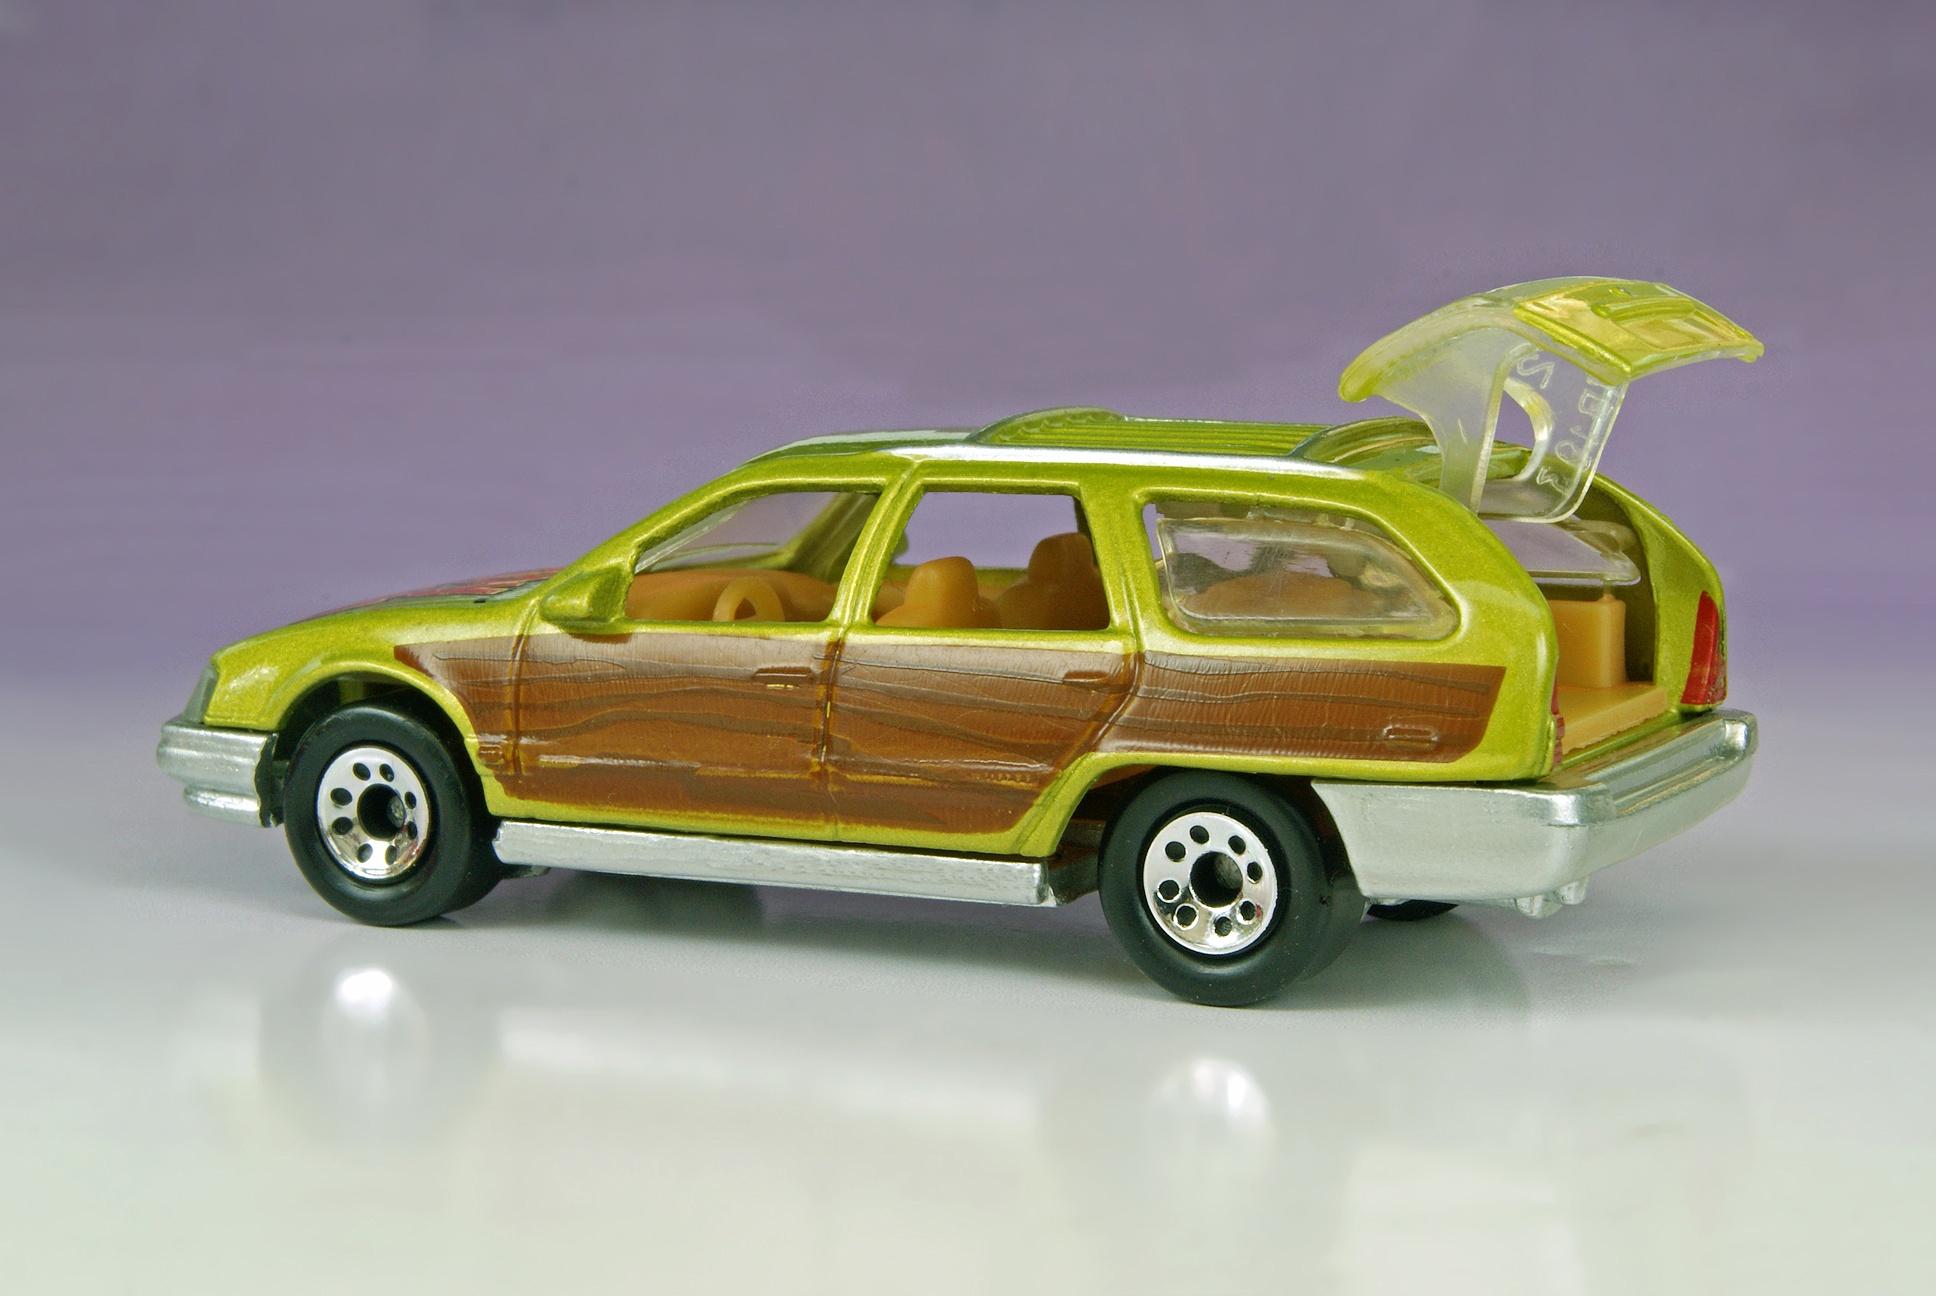 image 1986 mercury sable station wagon. Black Bedroom Furniture Sets. Home Design Ideas